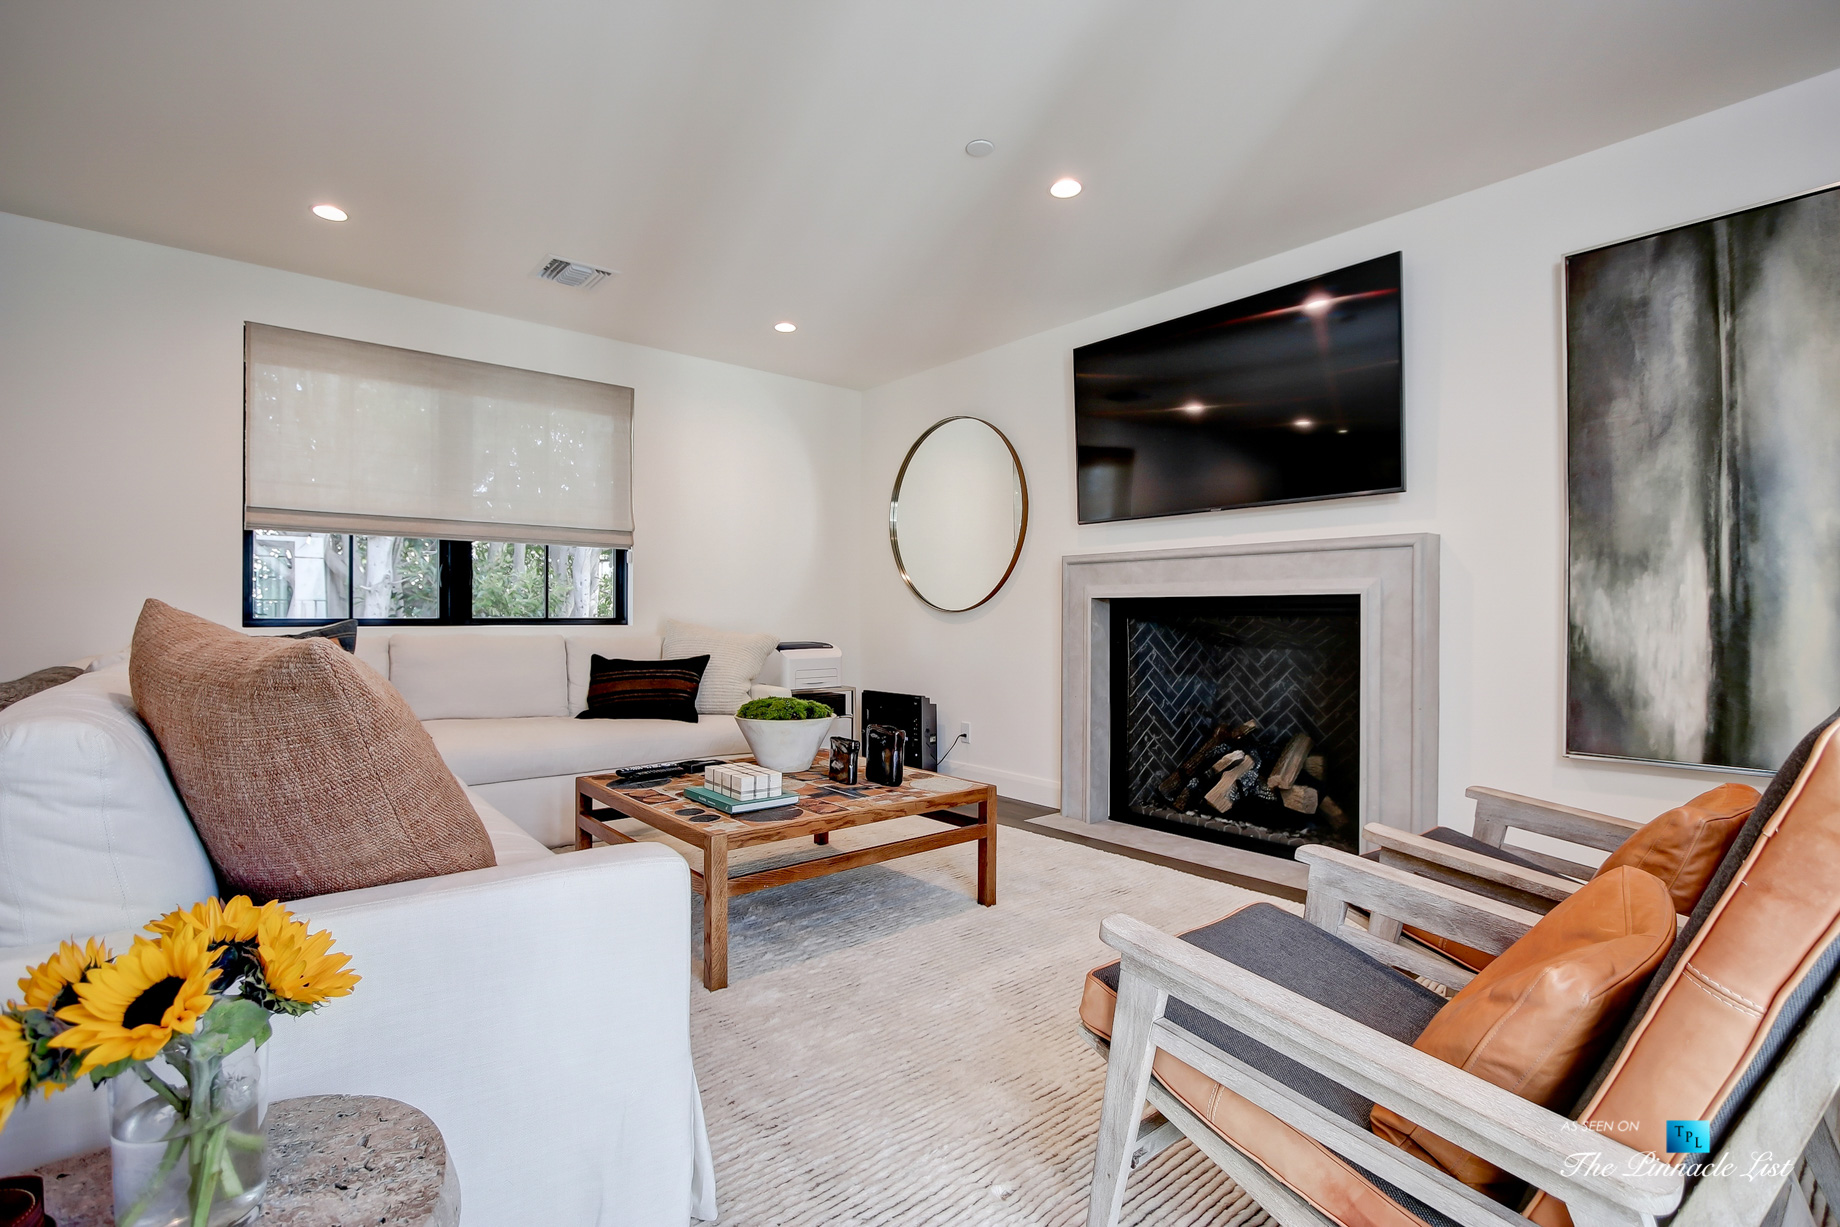 825 Highview Ave, Manhattan Beach, CA, USA - Private Den - Luxury Real Estate - Modern Spanish Home